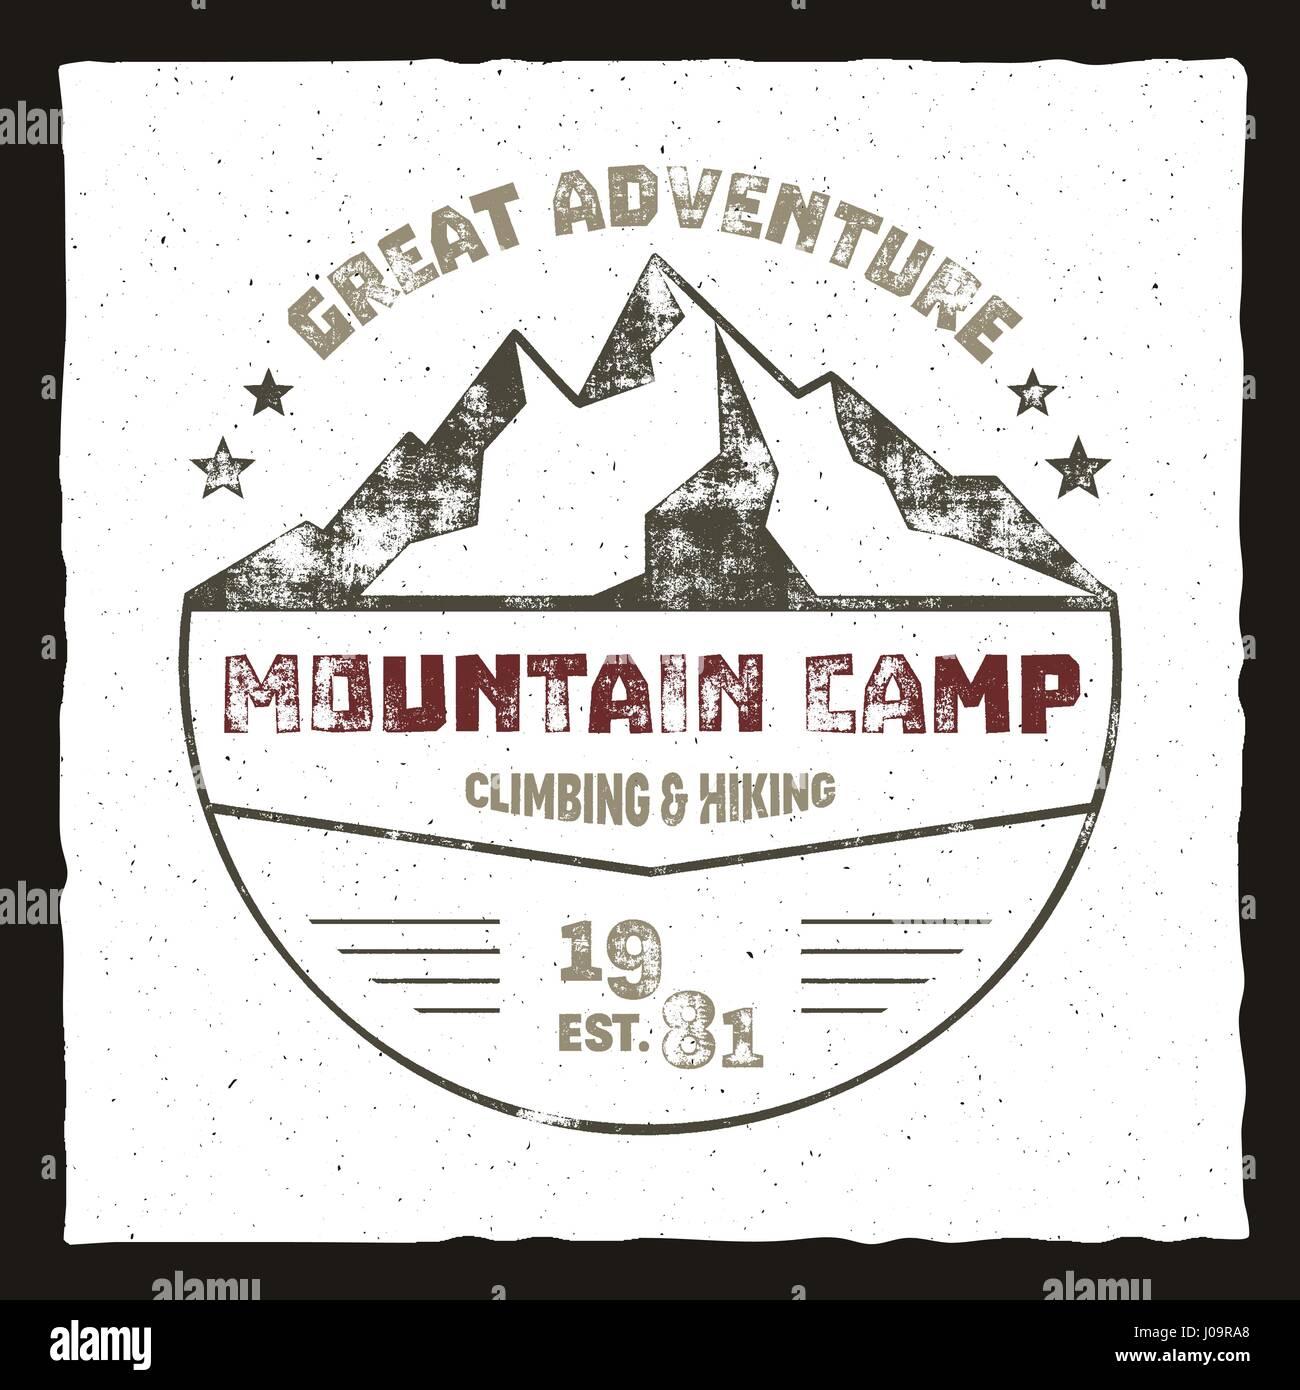 Mountainbike Camp Plakat Outdoor Abenteuer Logo Retro Farben